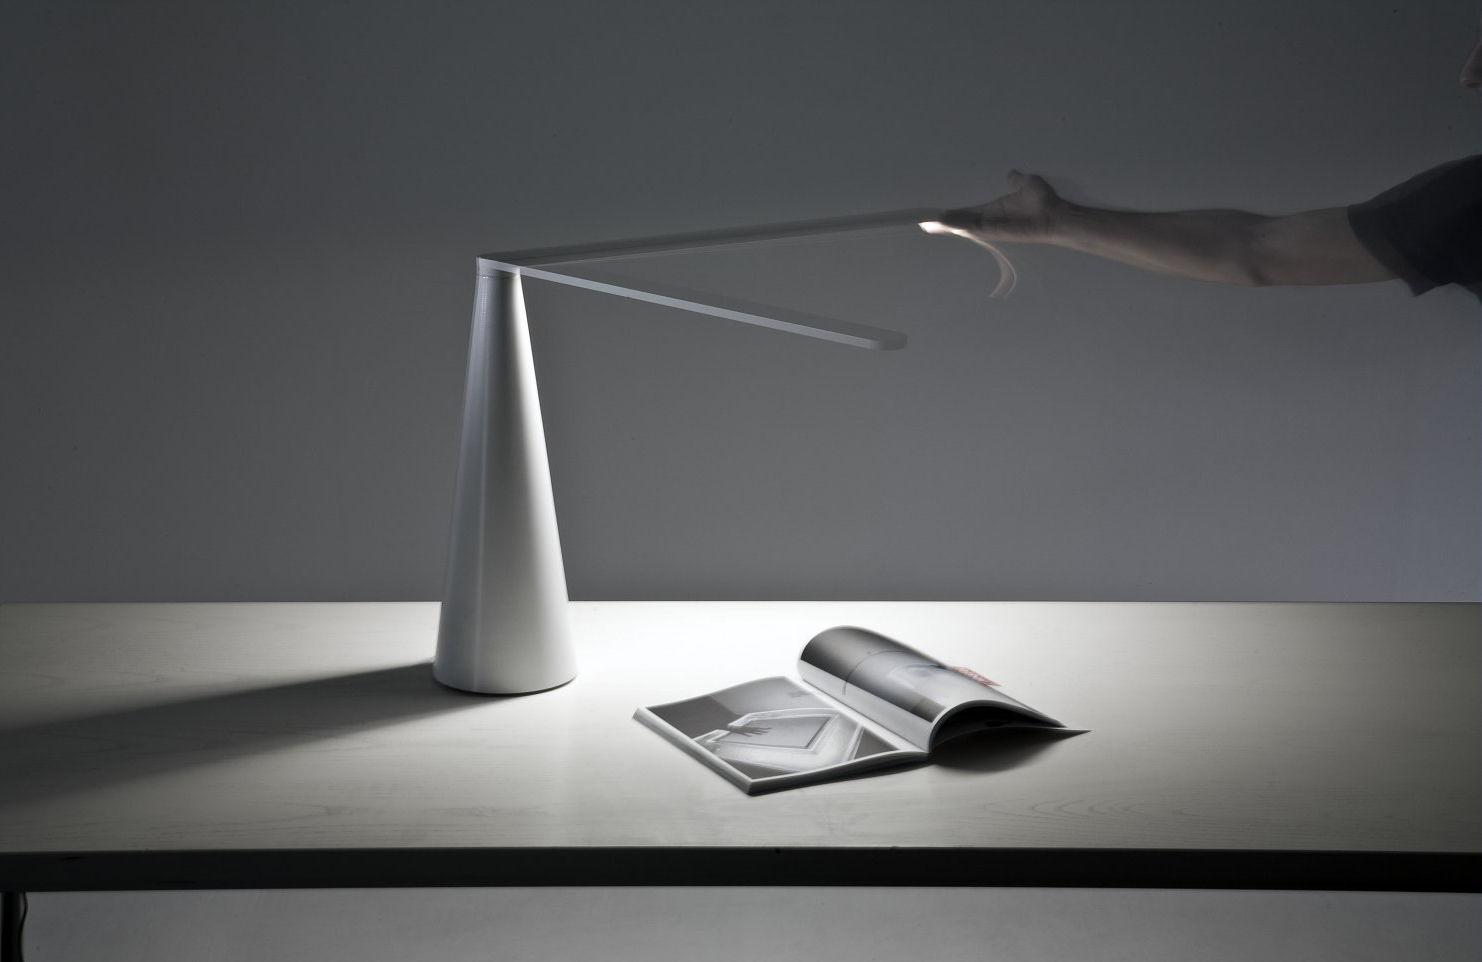 lampe de table elica petit mod le h 38 cm blanc martinelli luce. Black Bedroom Furniture Sets. Home Design Ideas